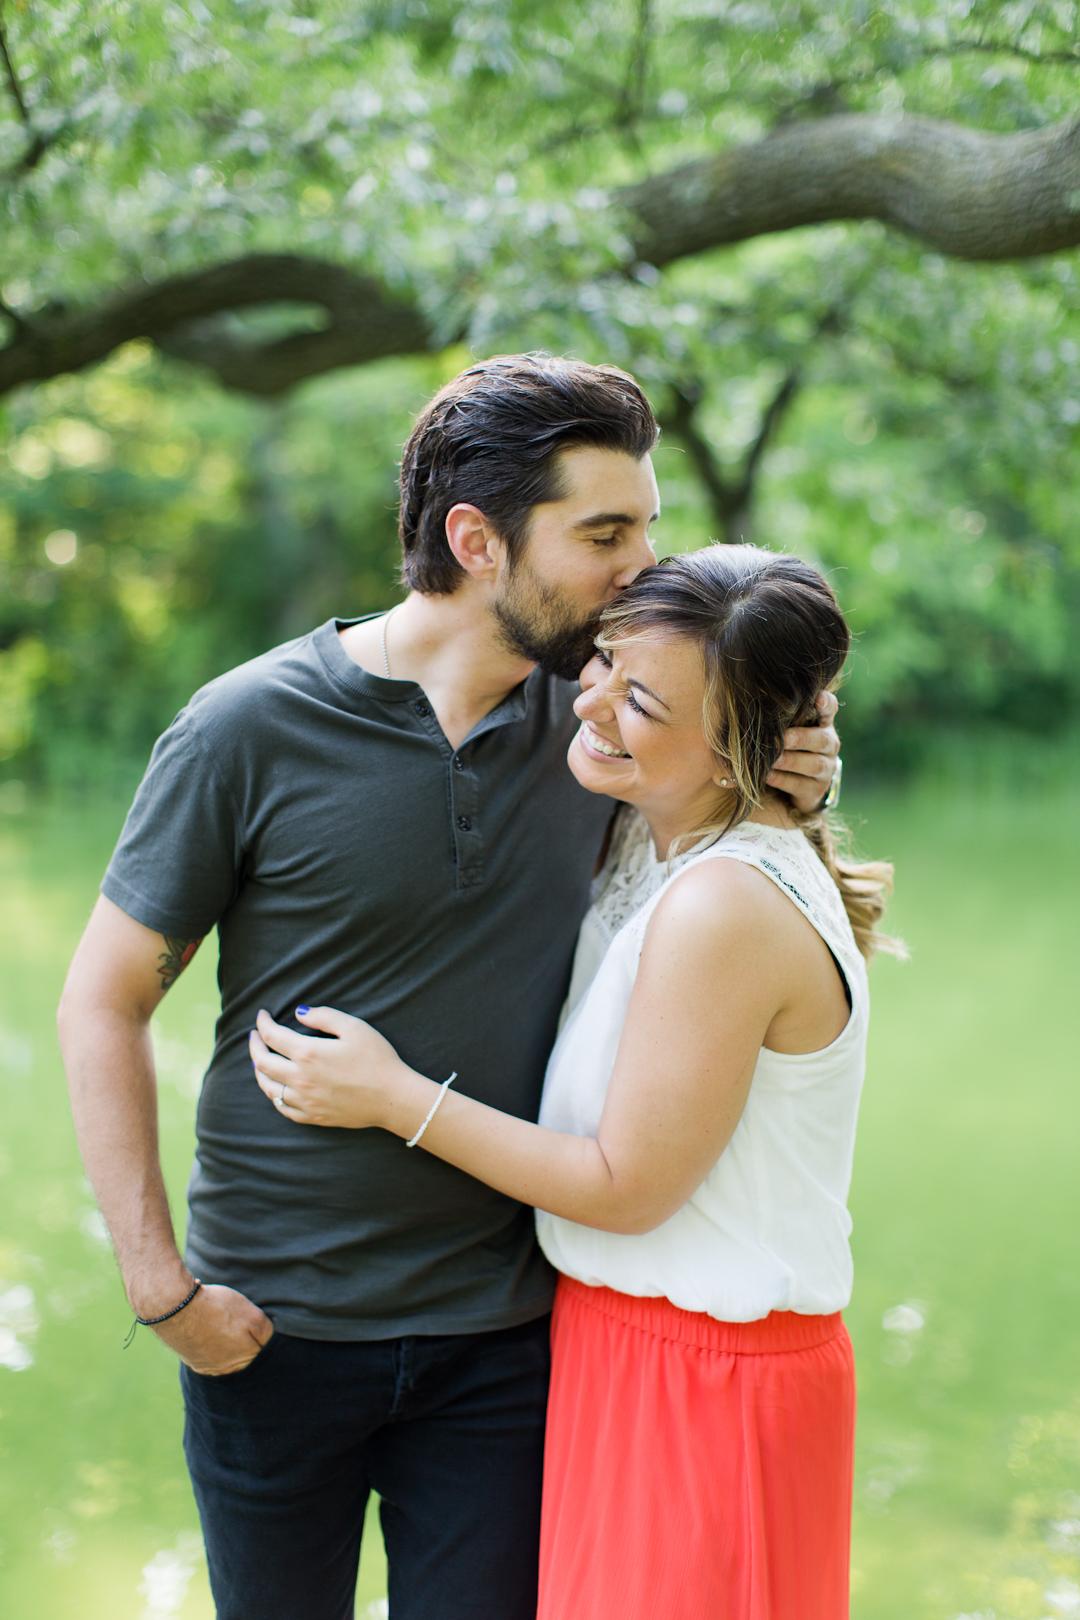 Melissa Kruse Photography - Eileen & Kenny Engagement Photos-42.jpg